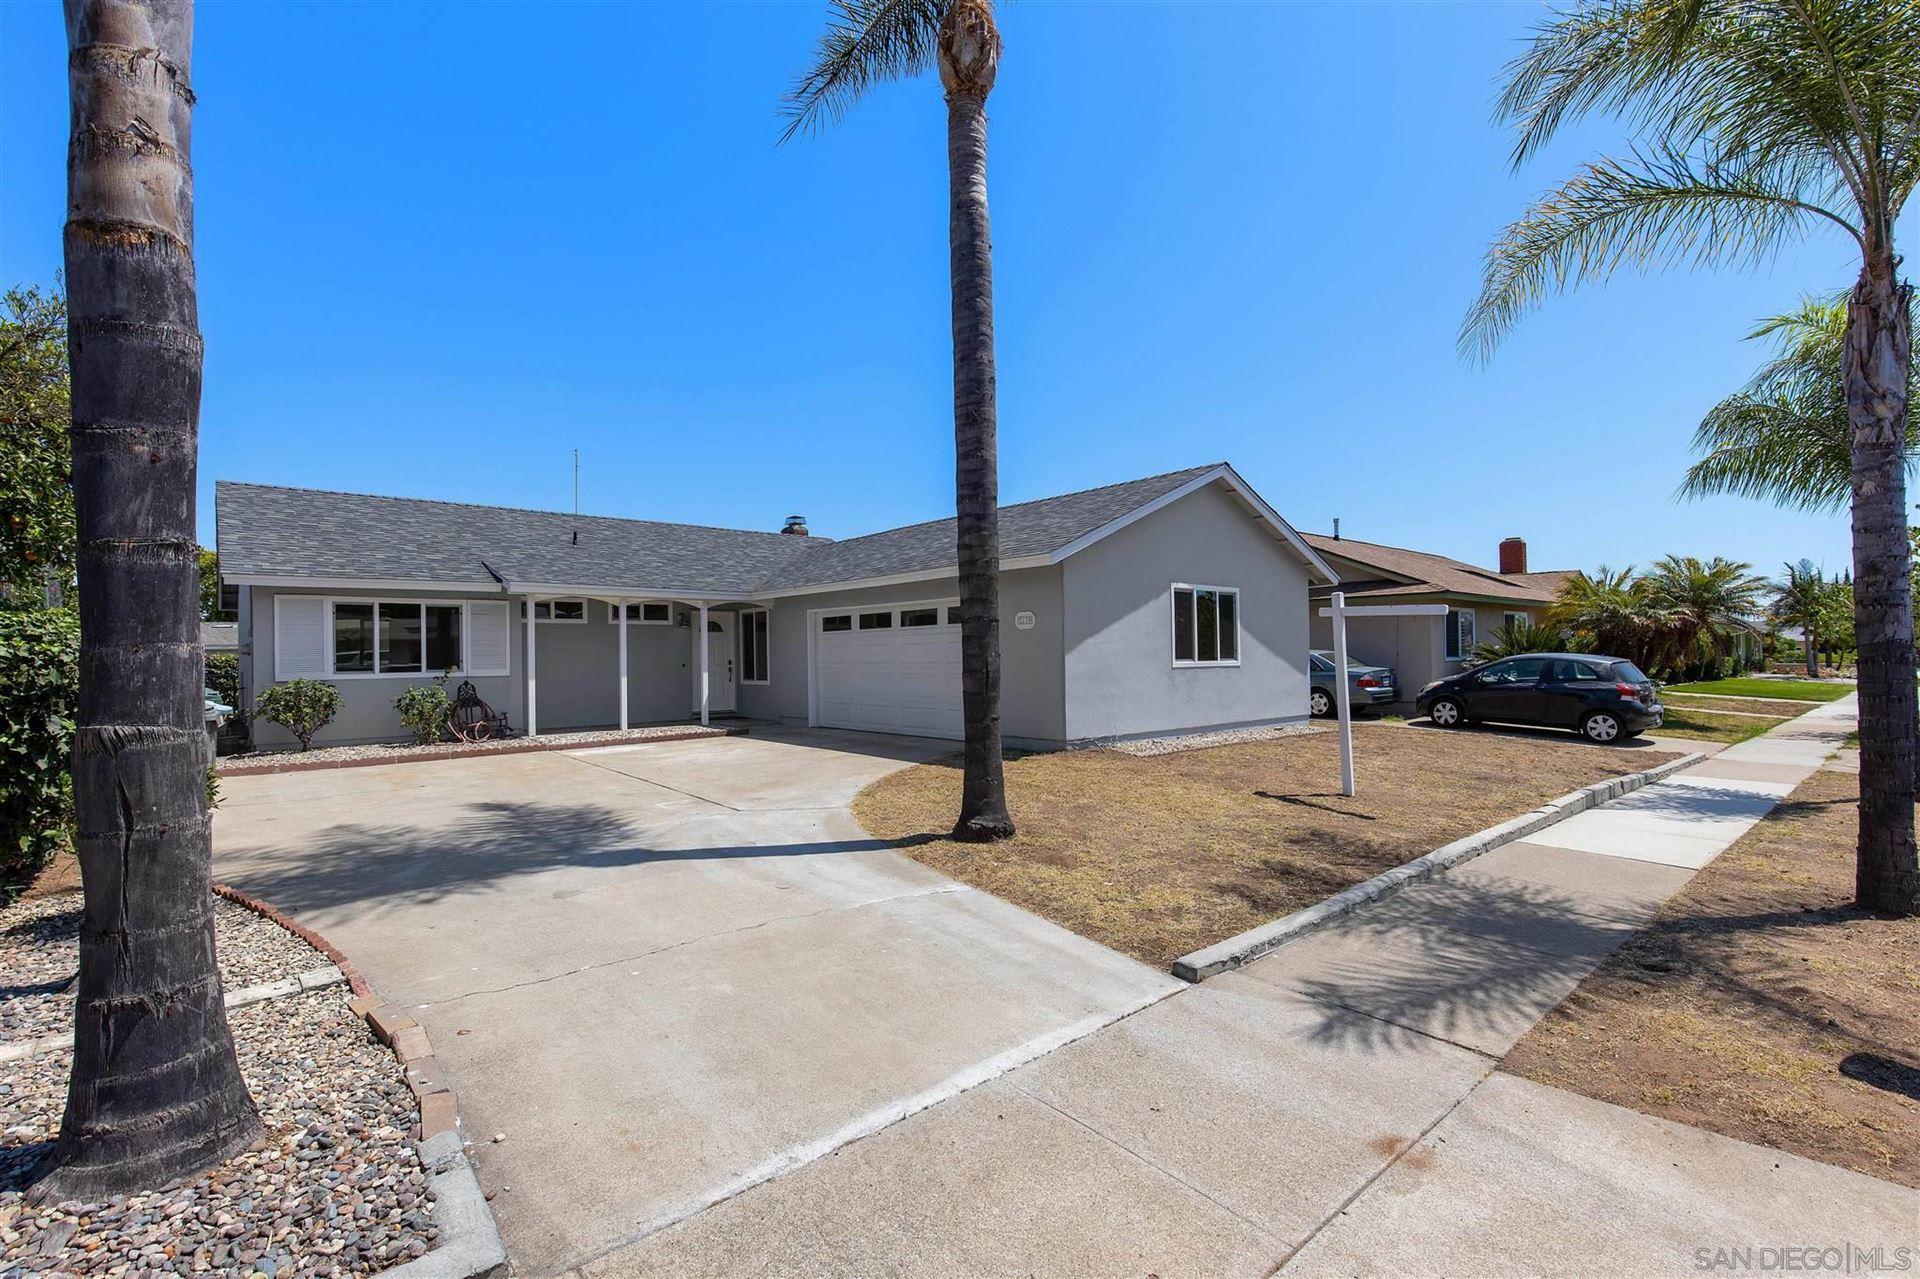 Photo of 2179 Montemar Ave, Escondido, CA 92027 (MLS # 210021392)